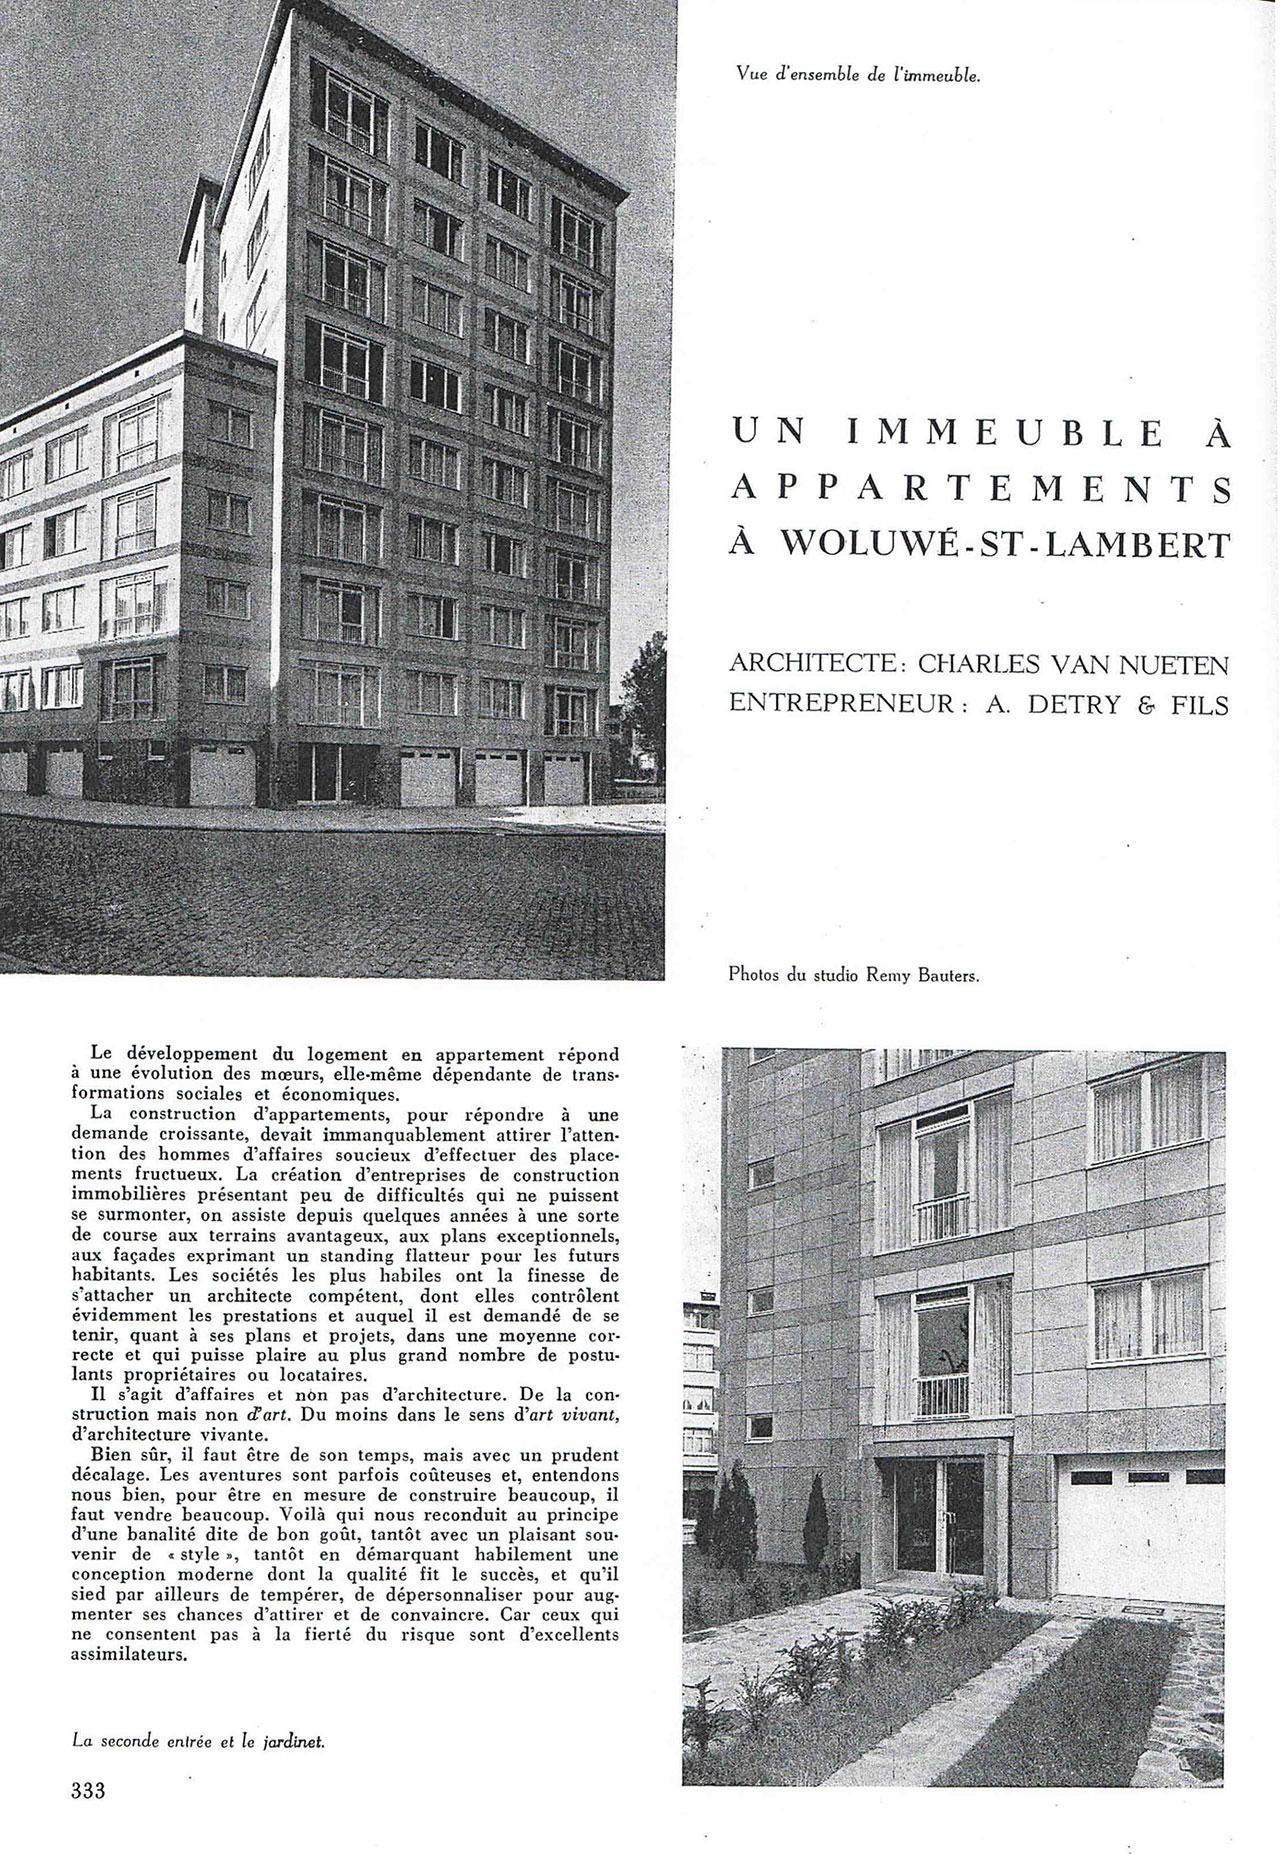 Un immeuble à appartements à Woluwé-St-Lambert